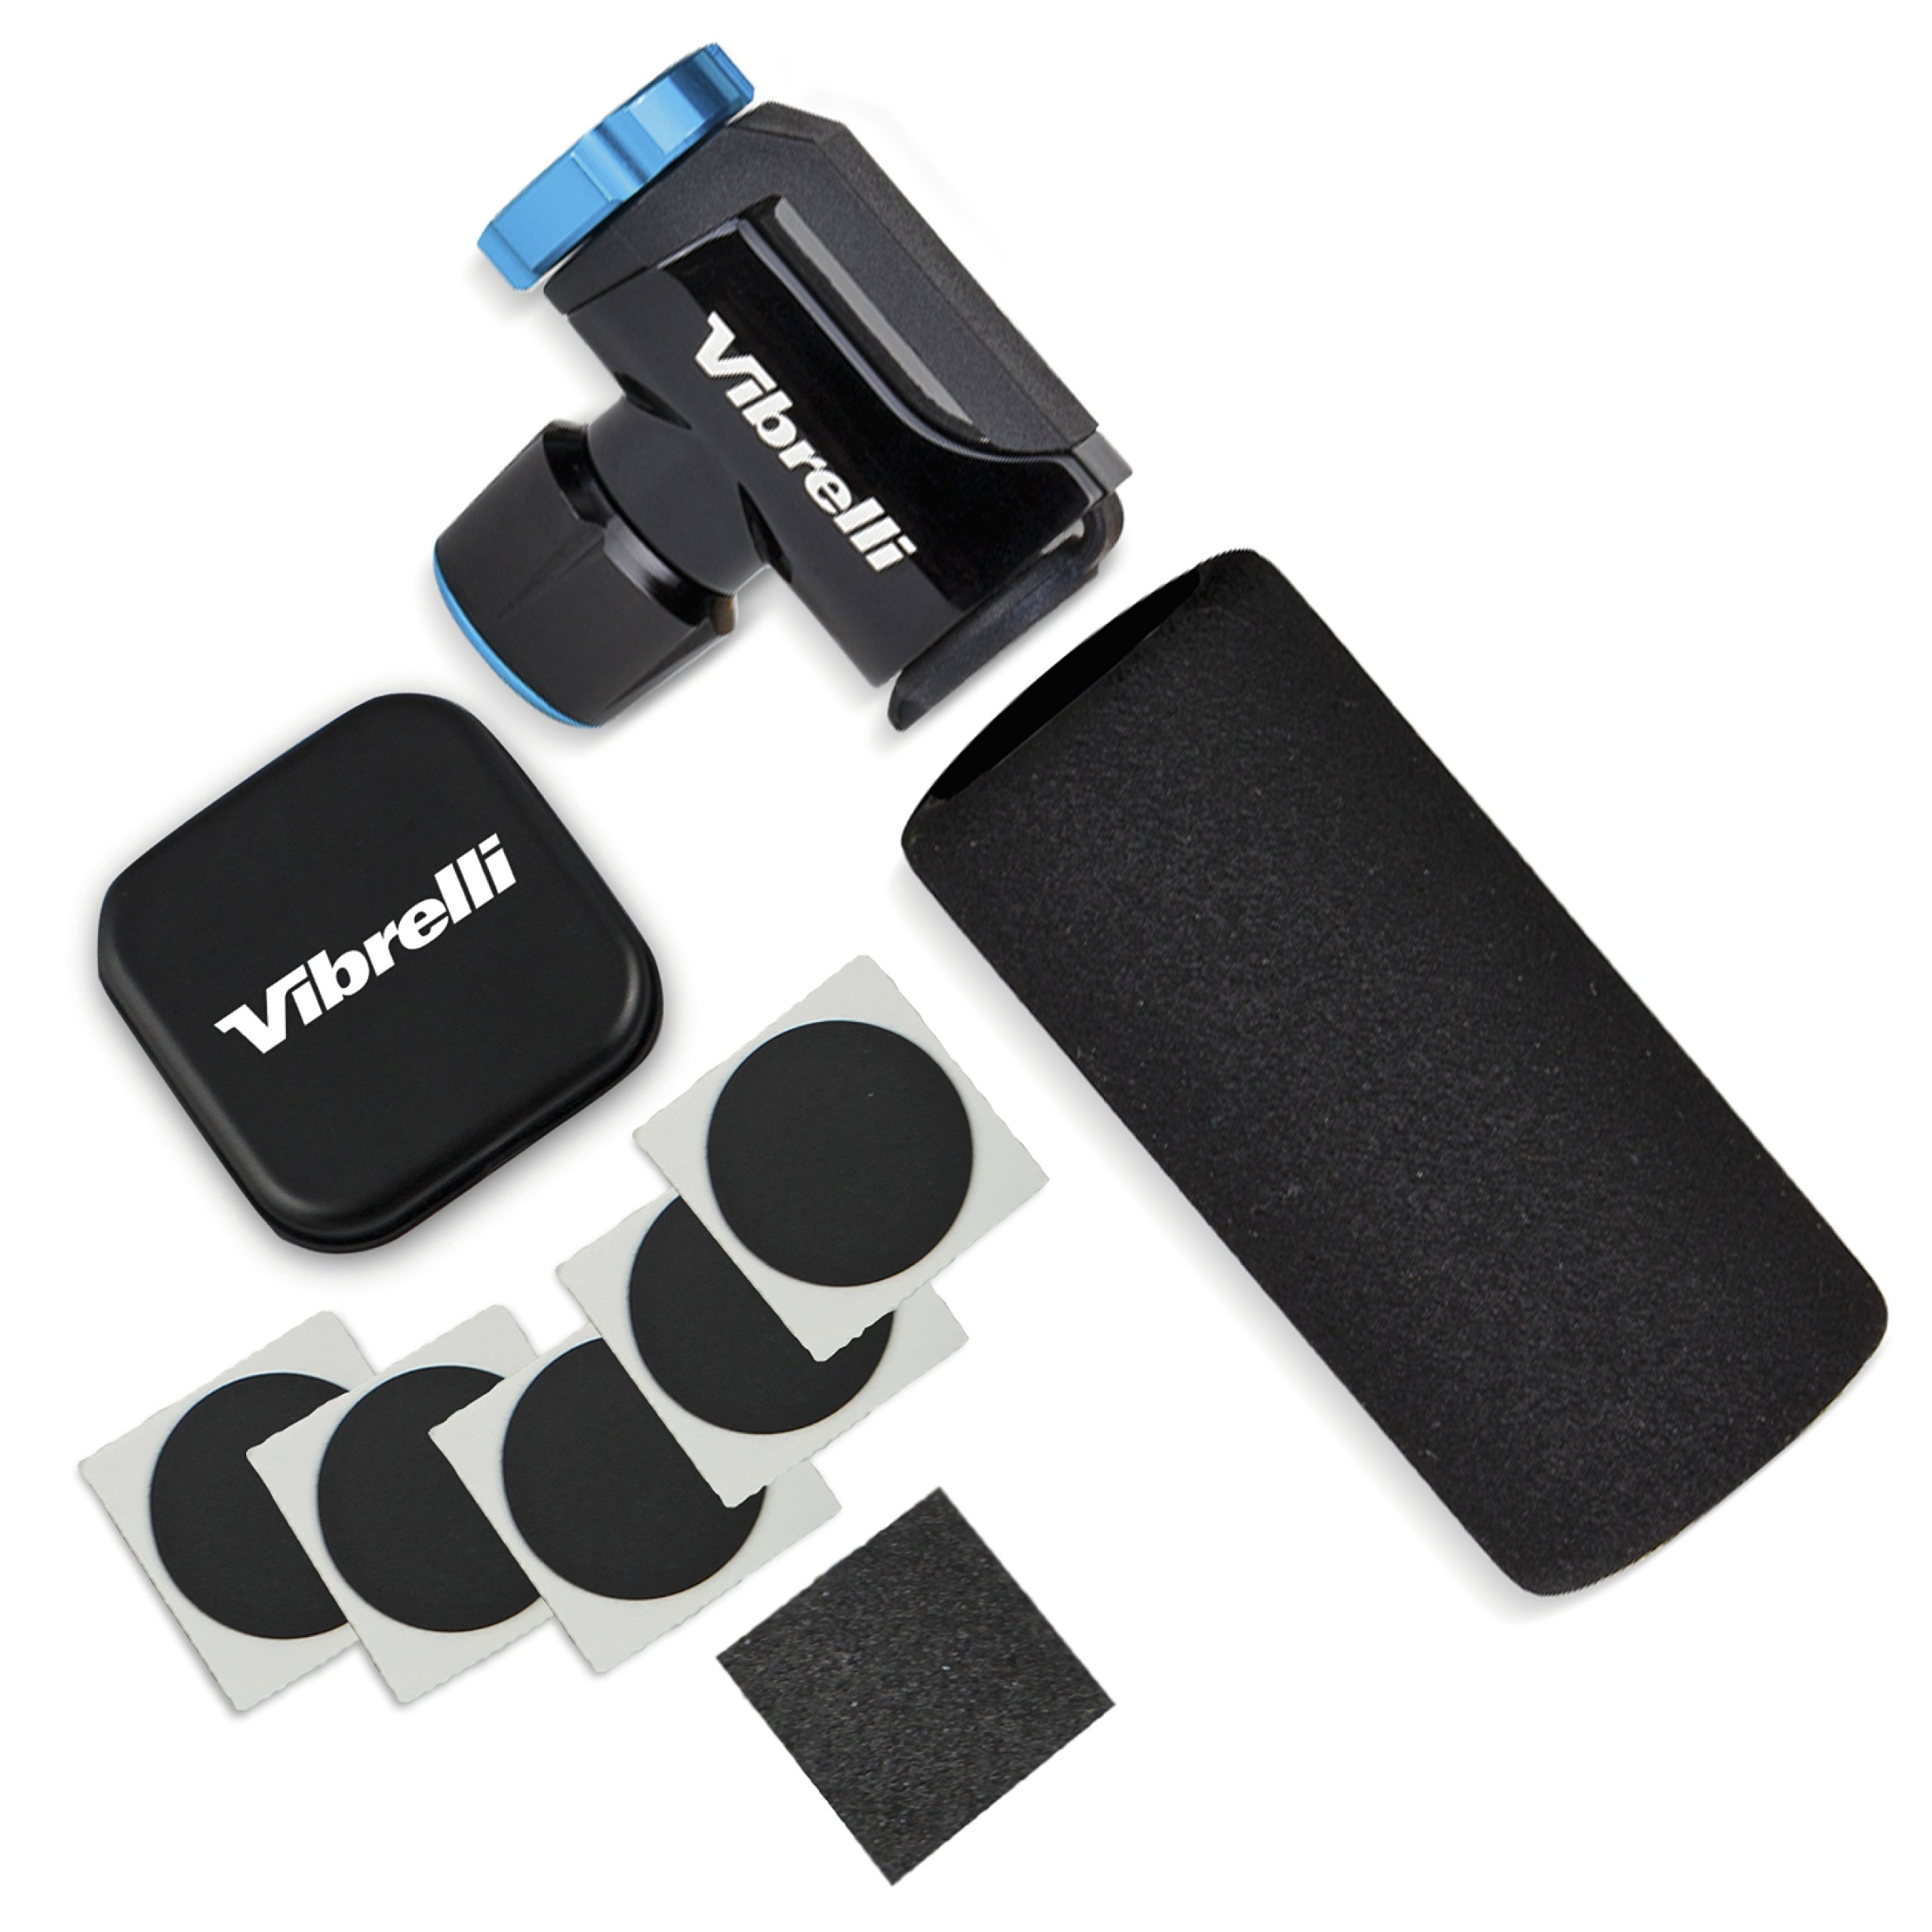 Vibrelli Performance CO2 Inflator - Glueless Puncture Kit - Presta & Schrader Valve Compatible